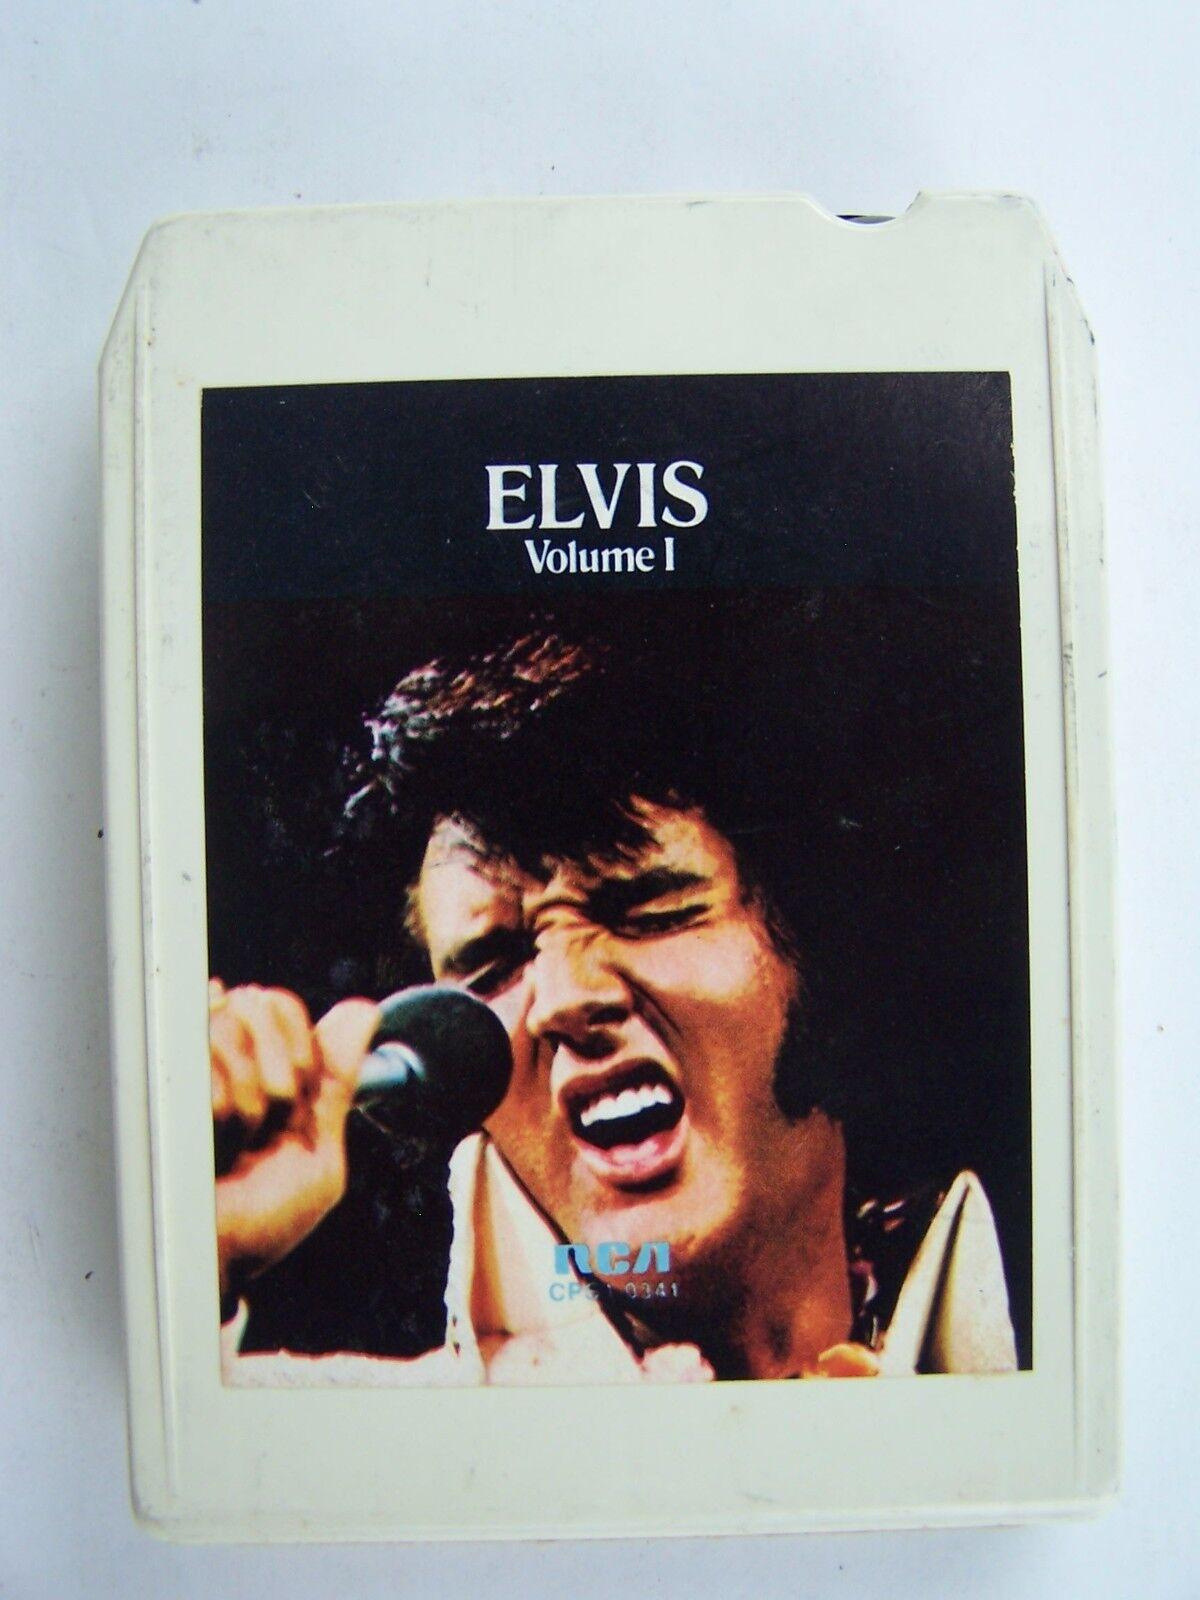 Elvis - A Legendary Performer Vol 1 8 Track Tape LP Alb